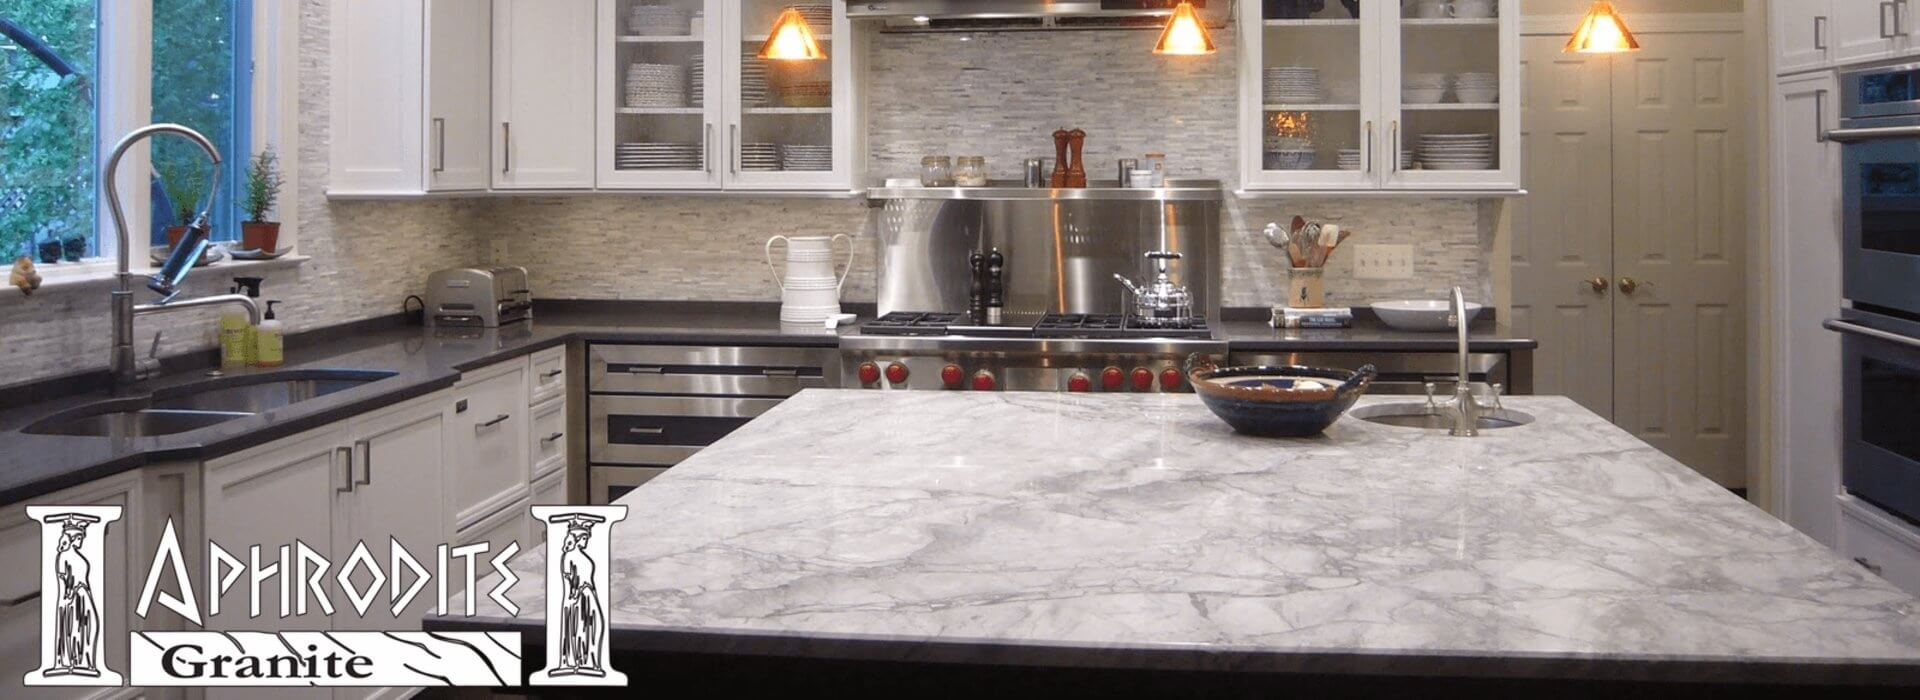 Aphrodite Granite - Granite Countertops St. Louis Area